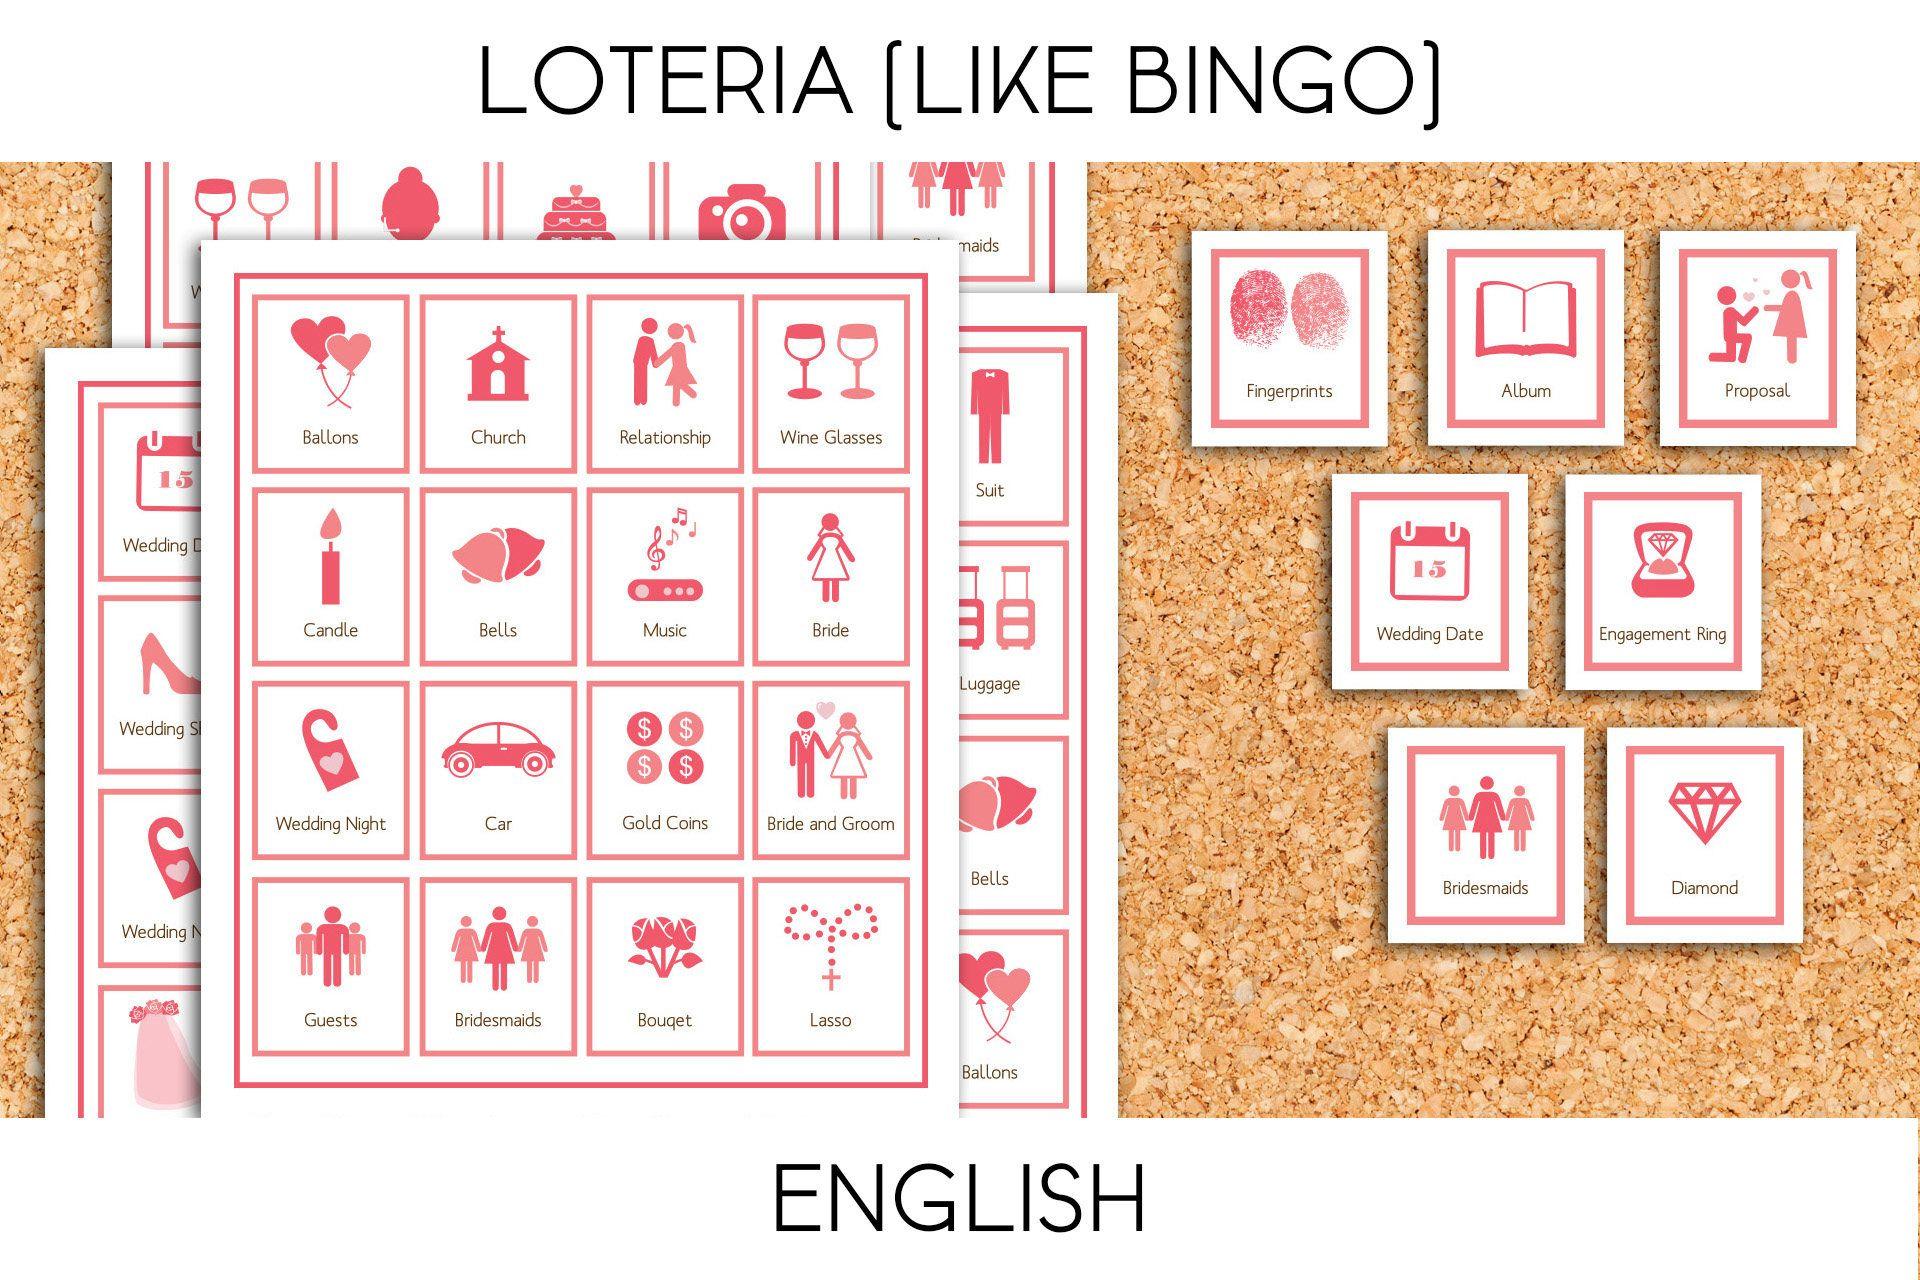 Loteria for Bridal Shower/Bachelorette Party (like Bingo